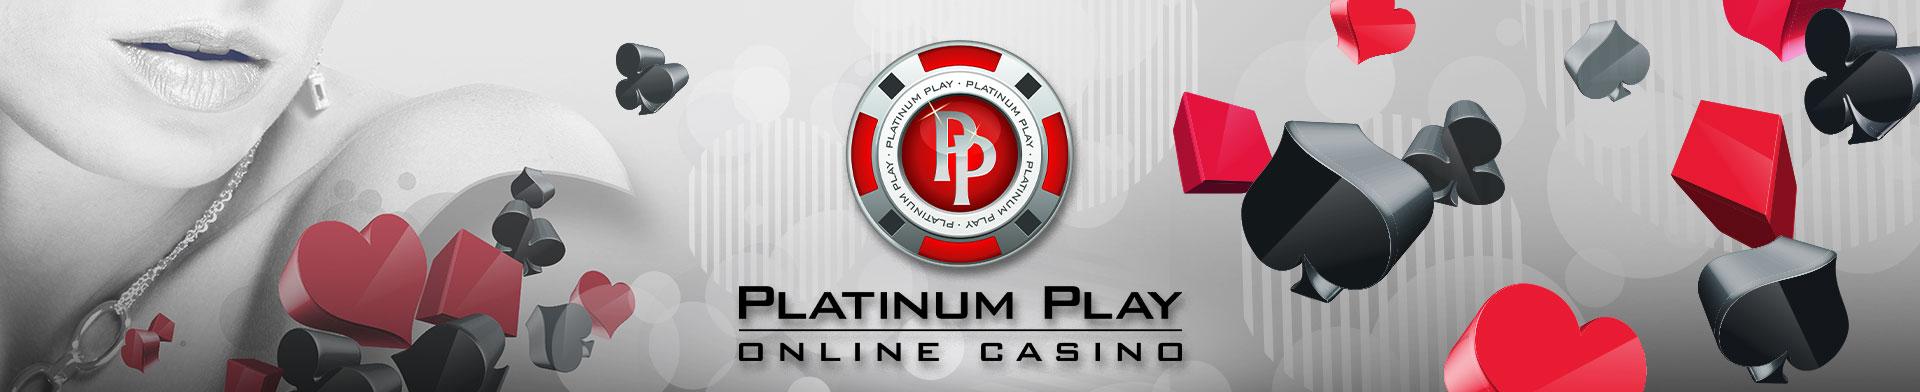 Platinum Play Banner